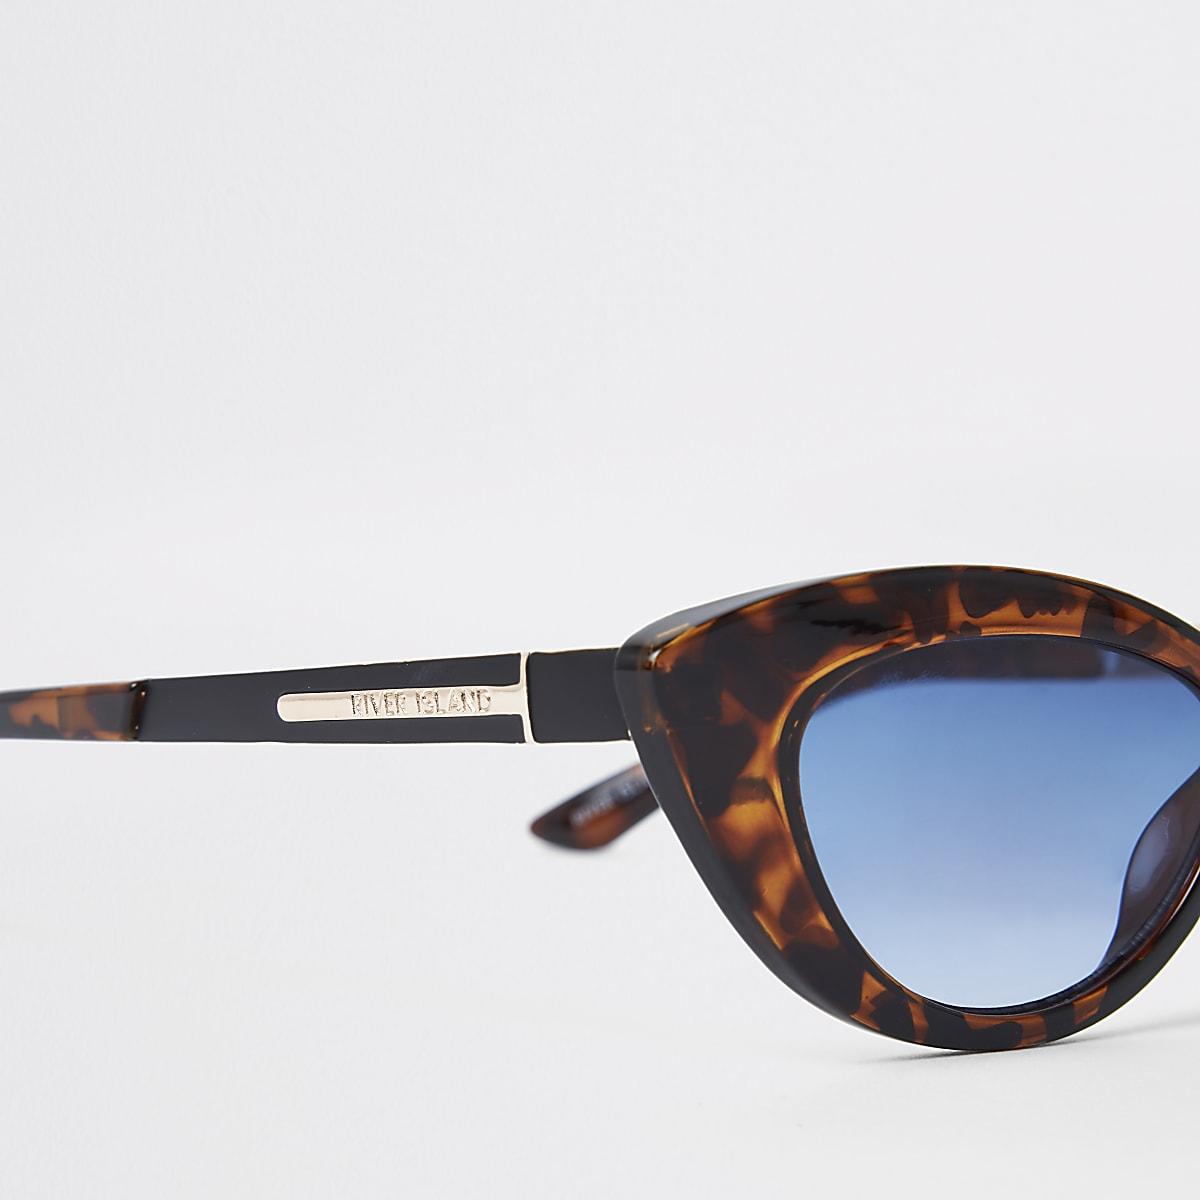 df84a5ee27081b Bruine visor-zonnebril met tortoise-print - Cat-eye-zonnebrillen ...